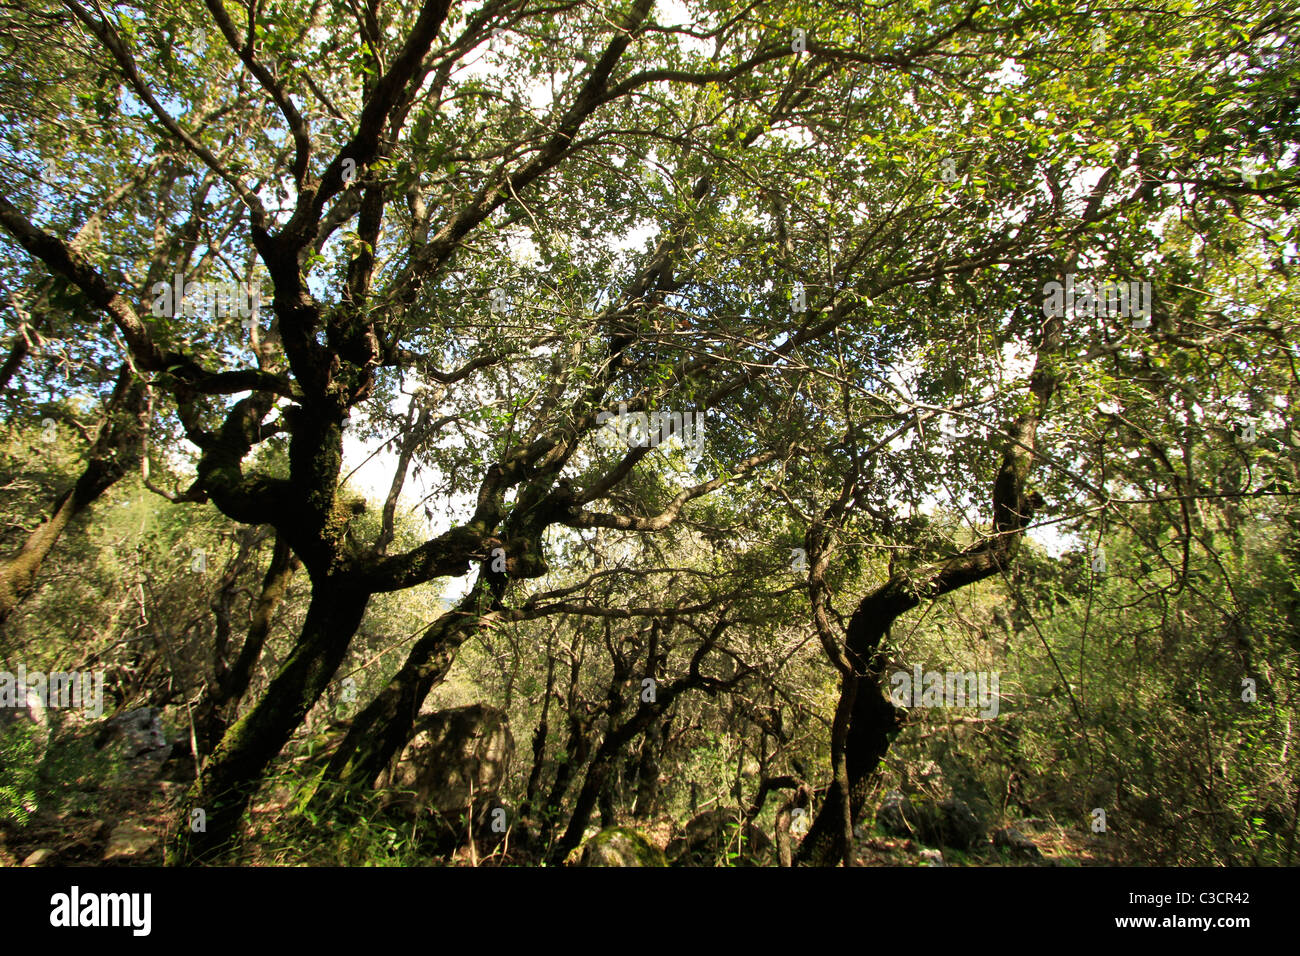 Israel, Upper Galilee, Oak trees at Baram forest Stock Photo